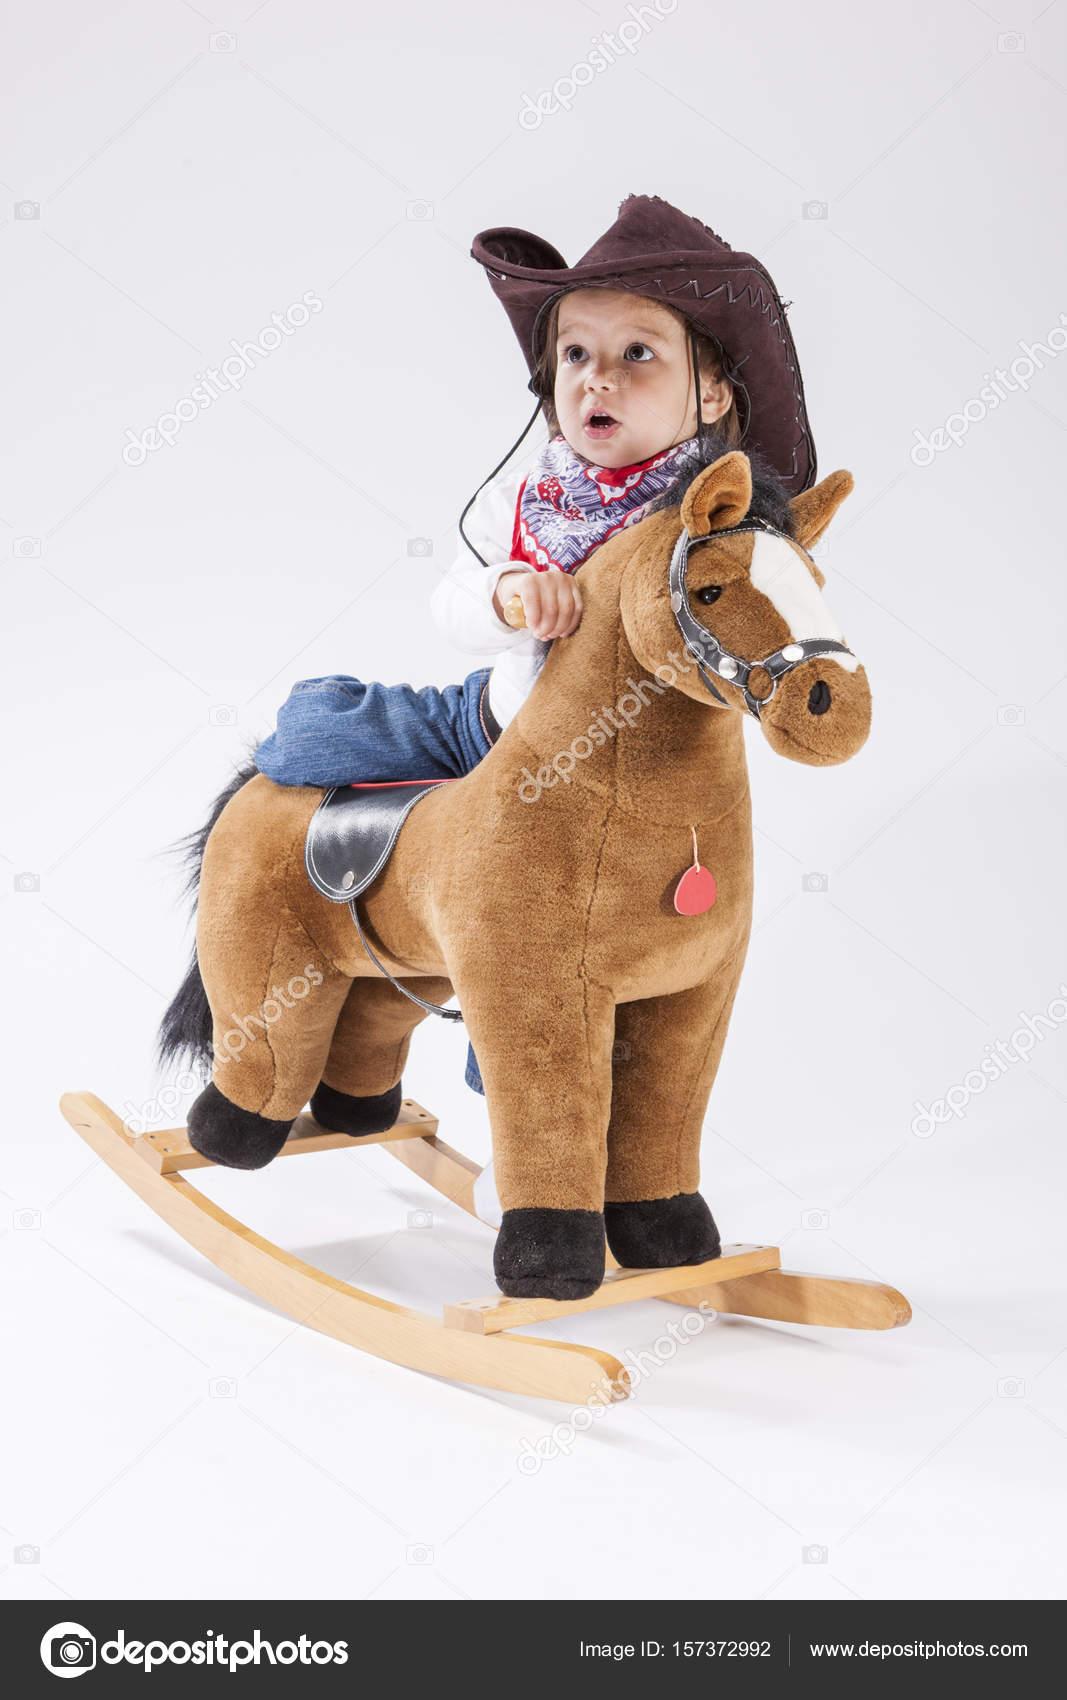 6ca2e62117 Consepts de niños. Caucásica niña posando en ropa vaquera con caballo de  juguete contra la composición de la imagen en blanco Background.